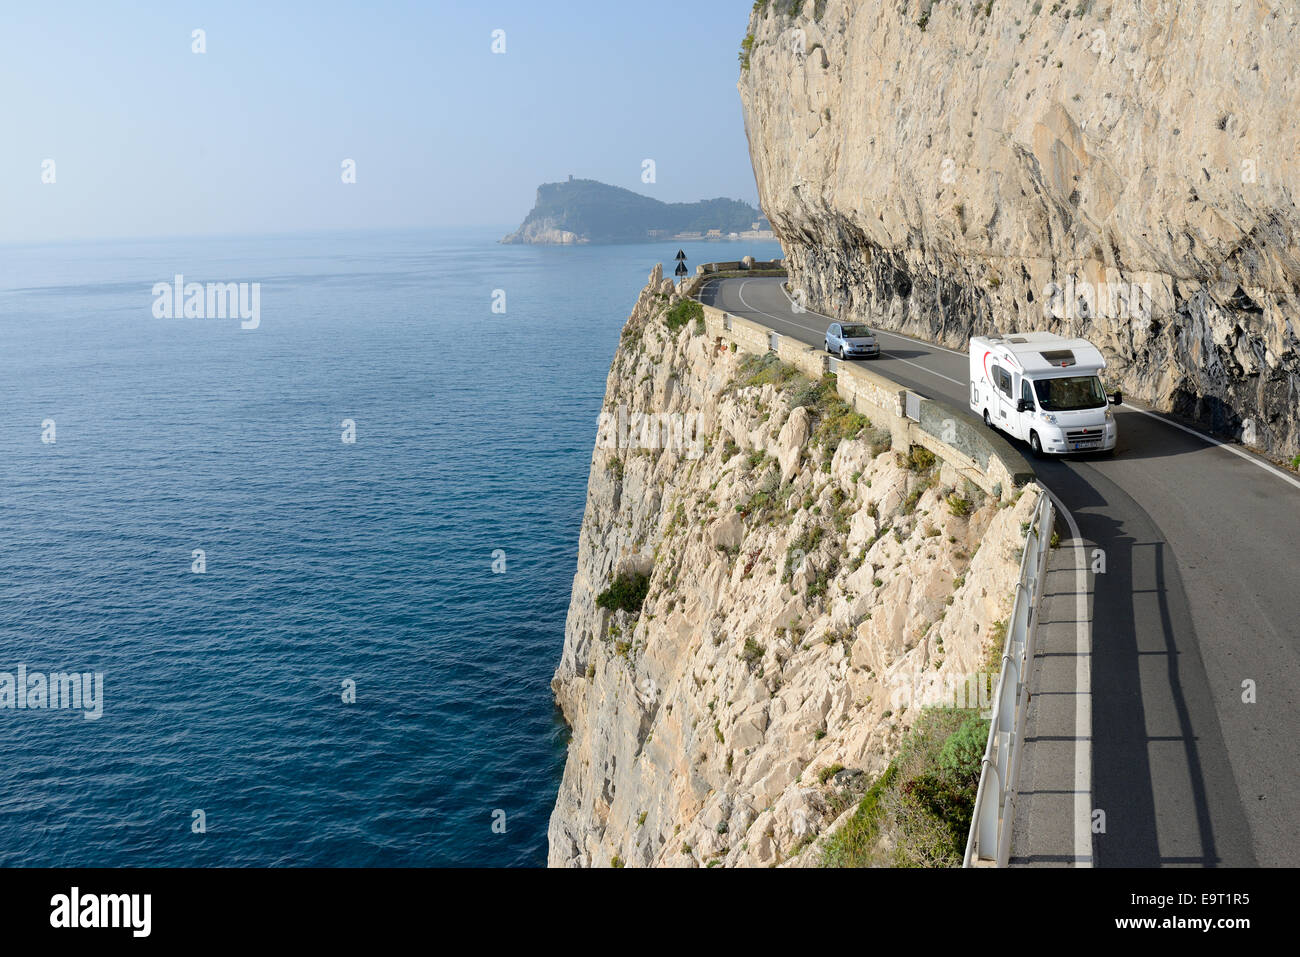 MOTORHOME ON A SCENIC ROAD BY THE MEDITERRANEAN SEA. Capo Noli, Liguria, Italy. - Stock Image